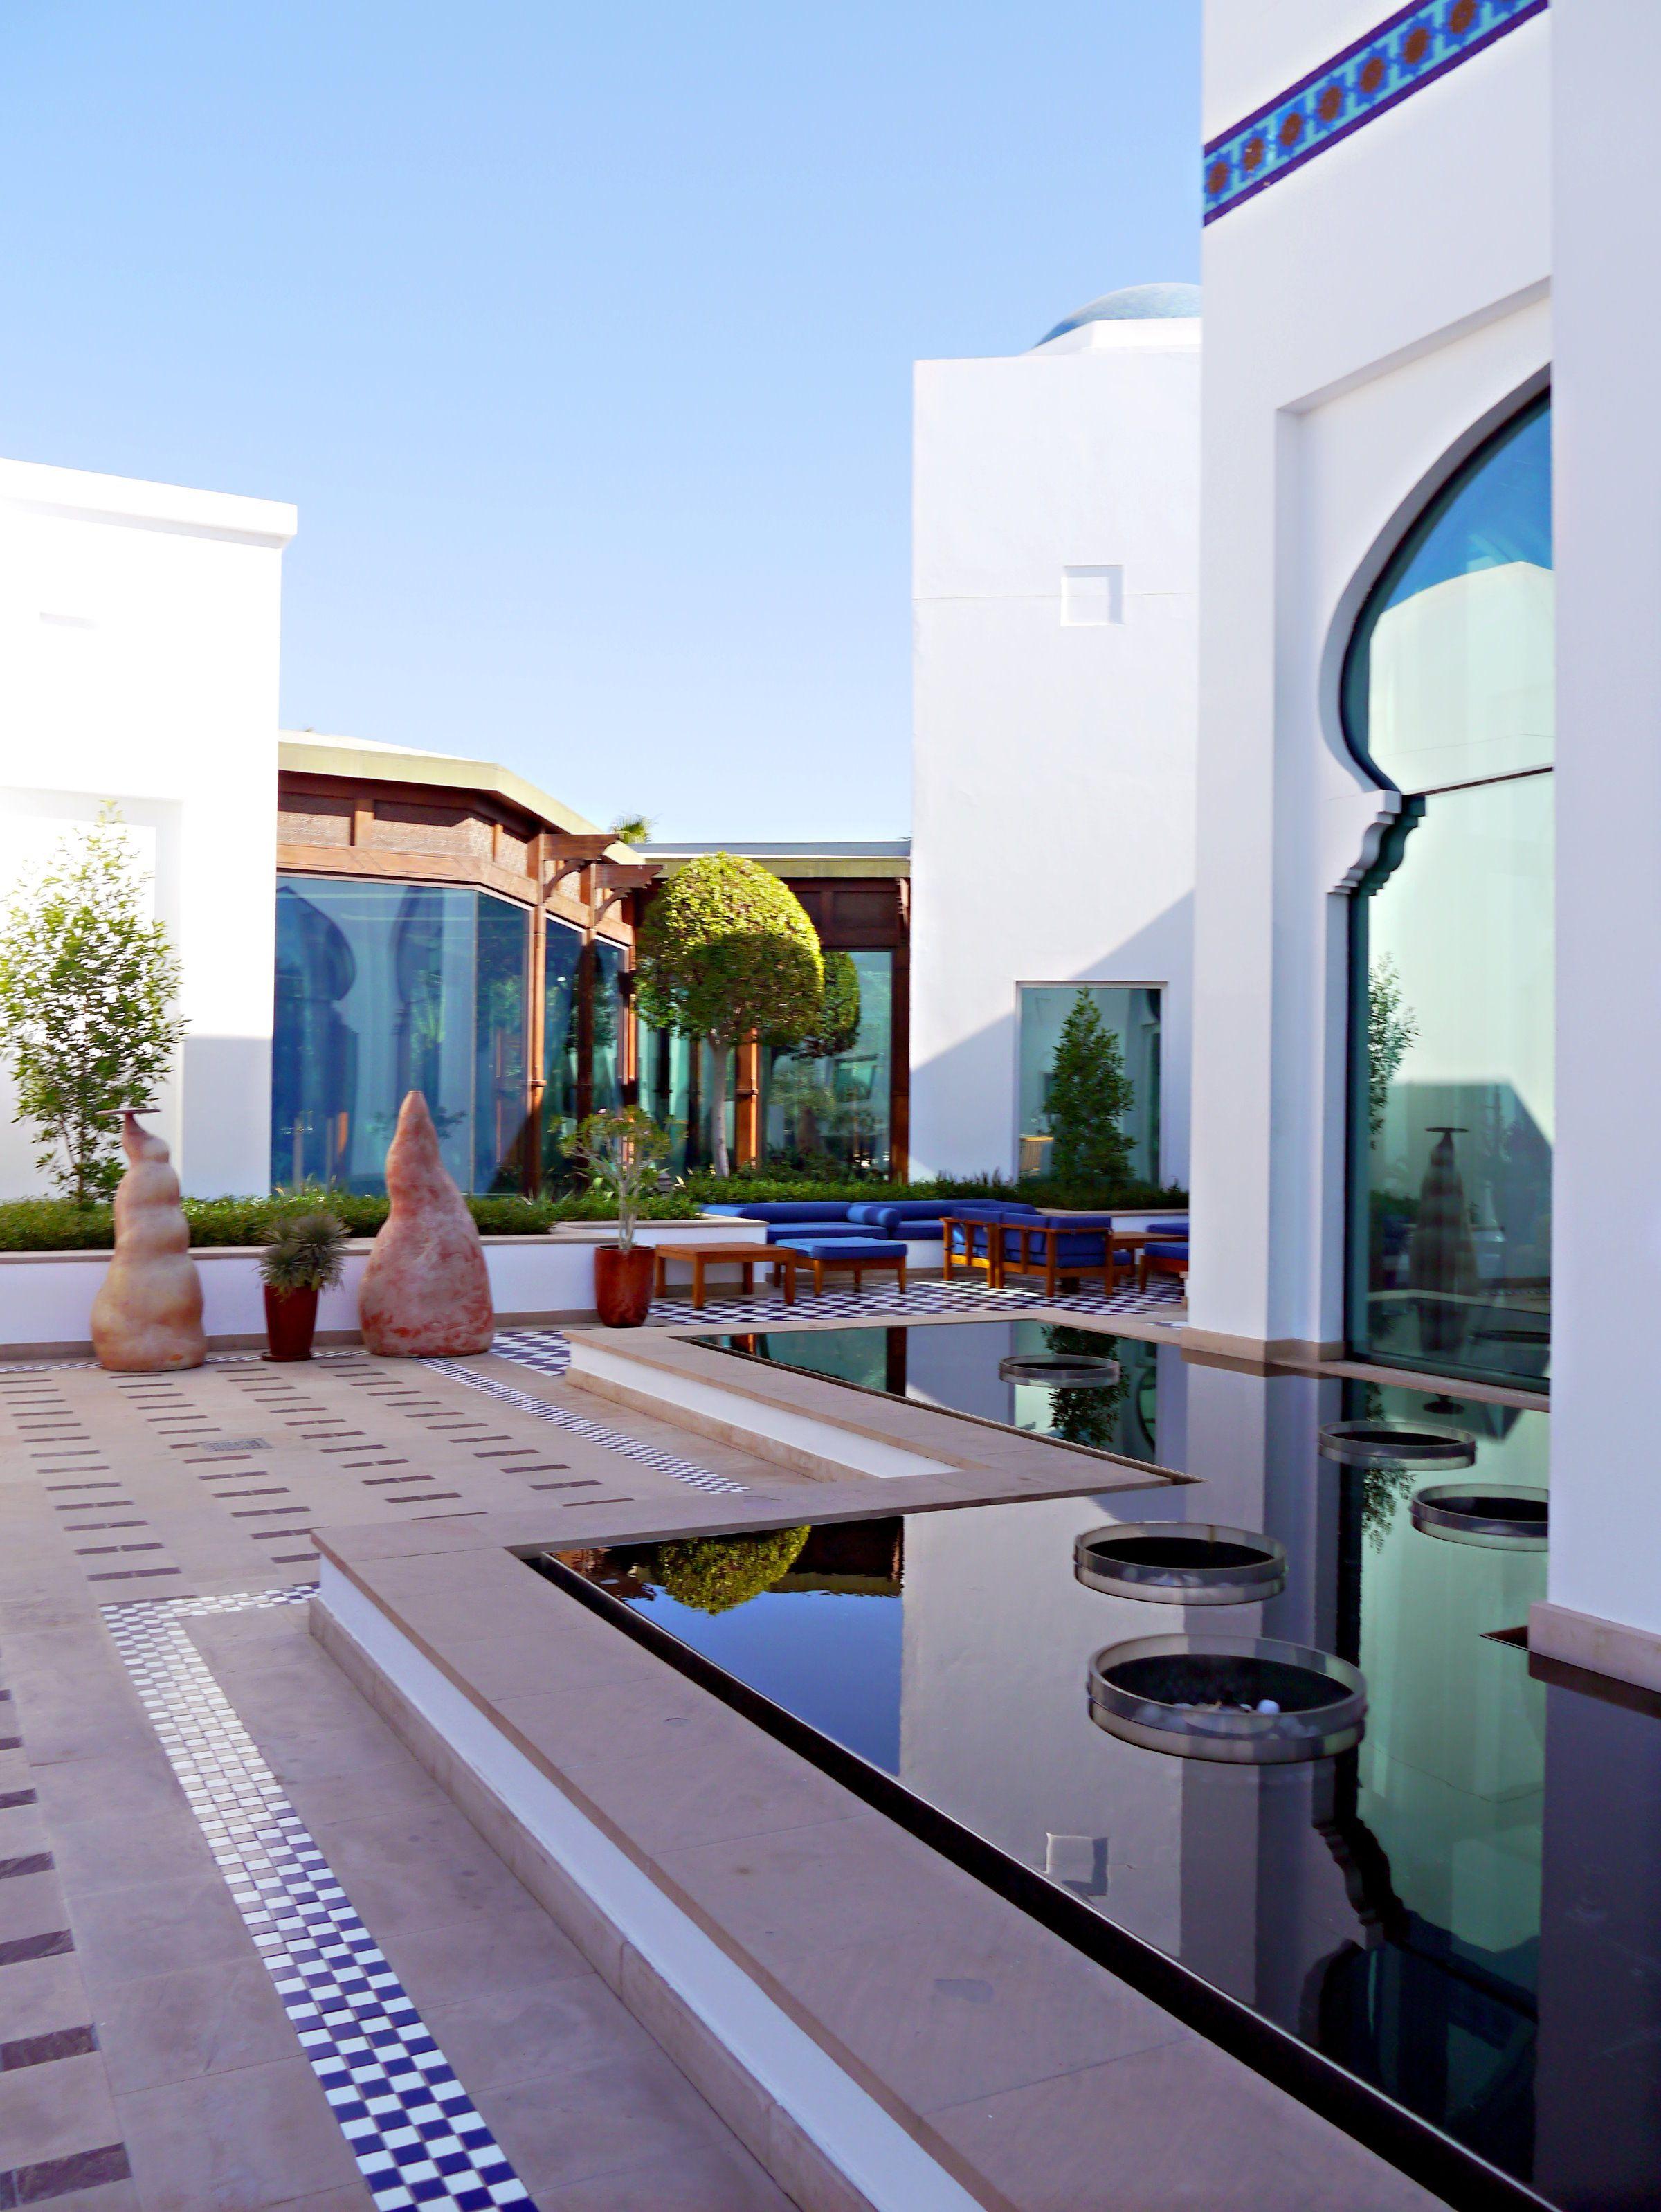 Grounds Park Hyatt Dubai Designed By Creative Kingdom Inc V Chedi Hotel Architecture Moorish Design